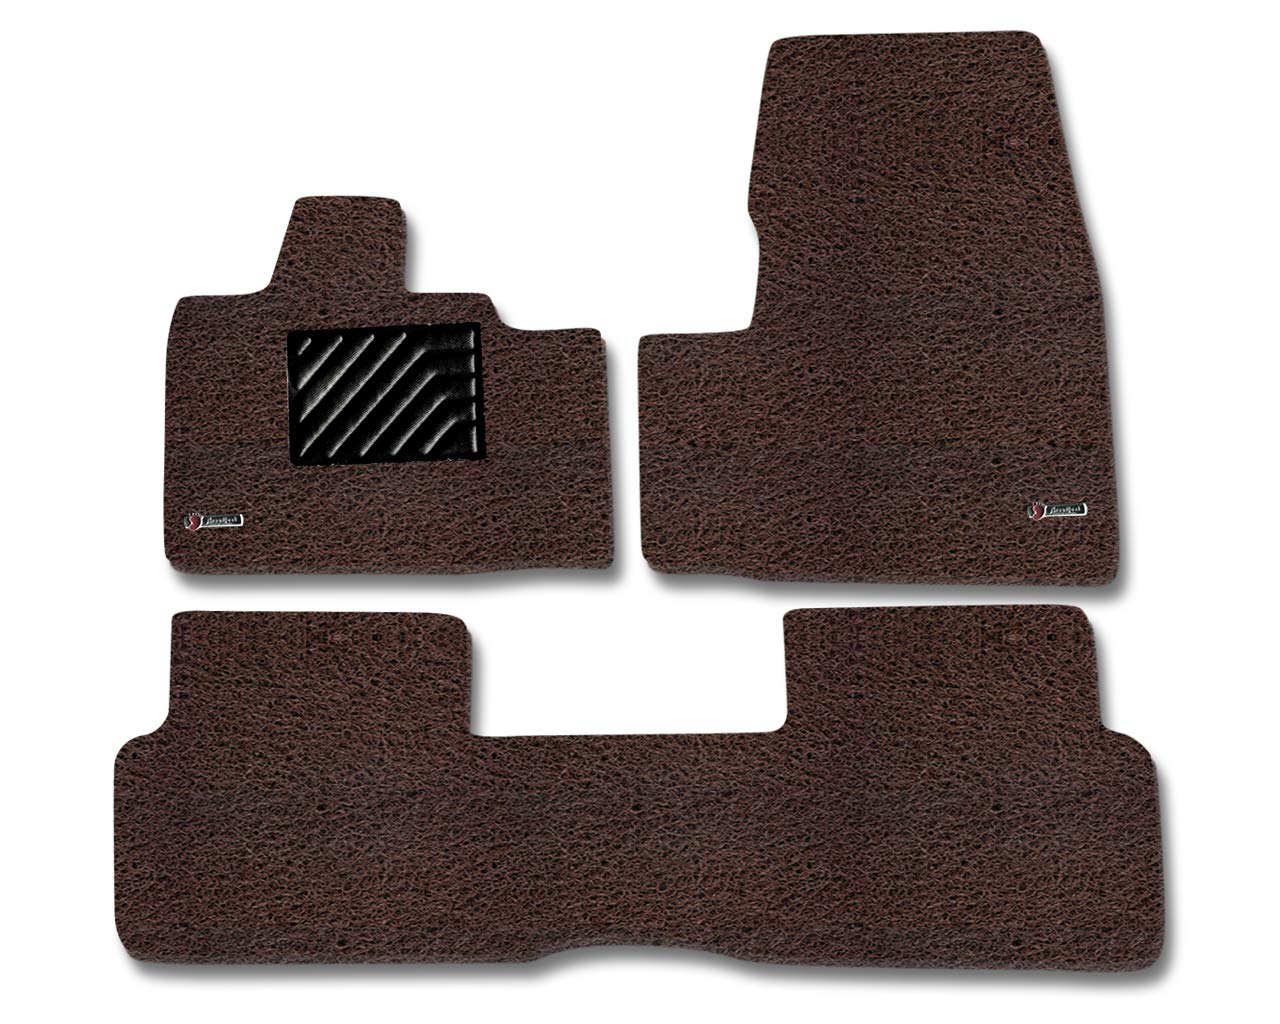 Tan /& Brown Broadfeet Custom Floor Liners for 2014-2016 BMW i3 All Weather Custom Carpet 3 Pieces